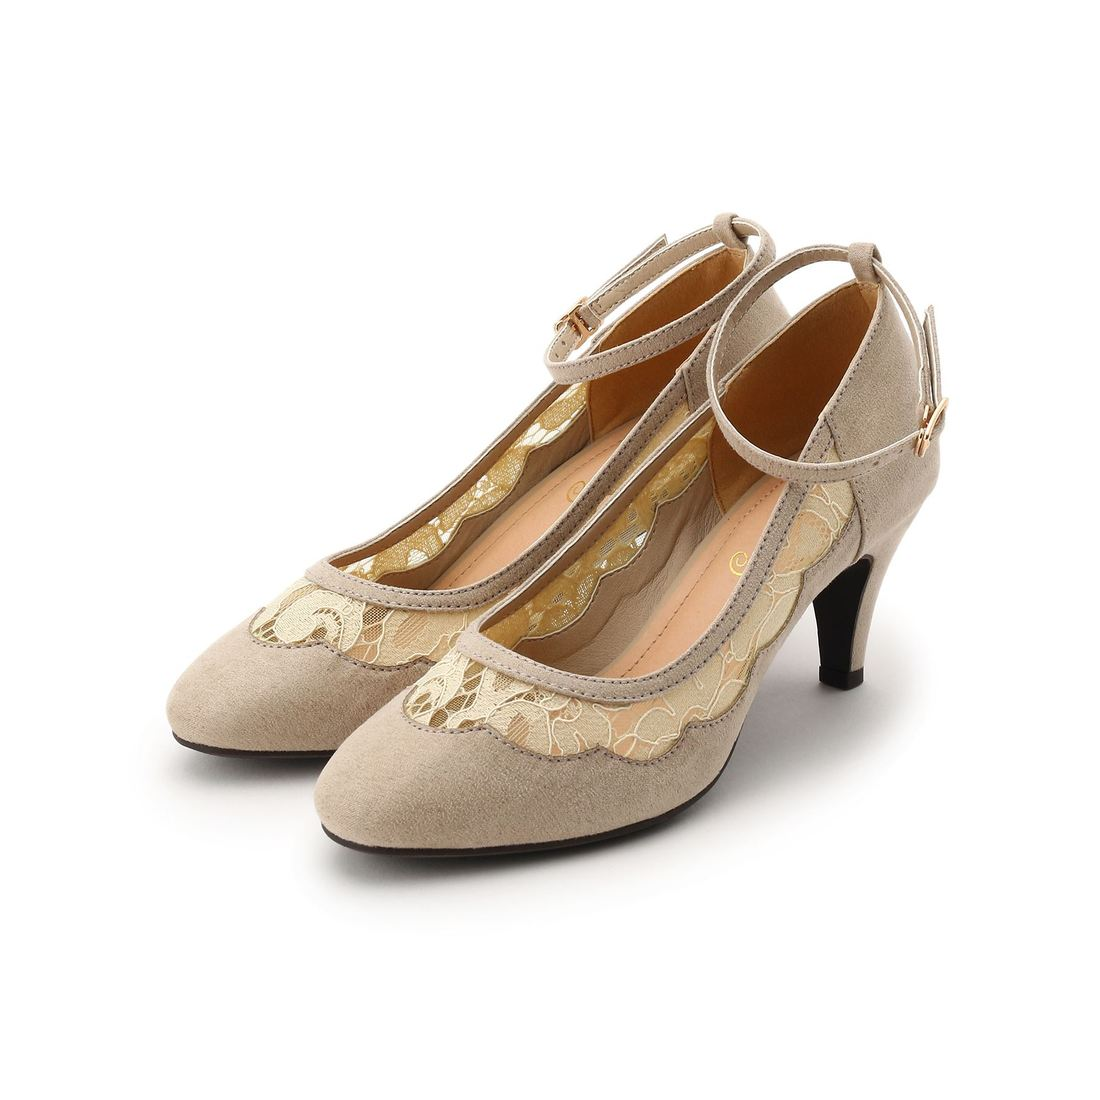 39e0bd88f65838 クチュール ブローチ Couture brooch サイドレースストラップパンプス (ベージュ) -靴&ファッション通販  ロコンド〜自宅で試着、気軽に返品